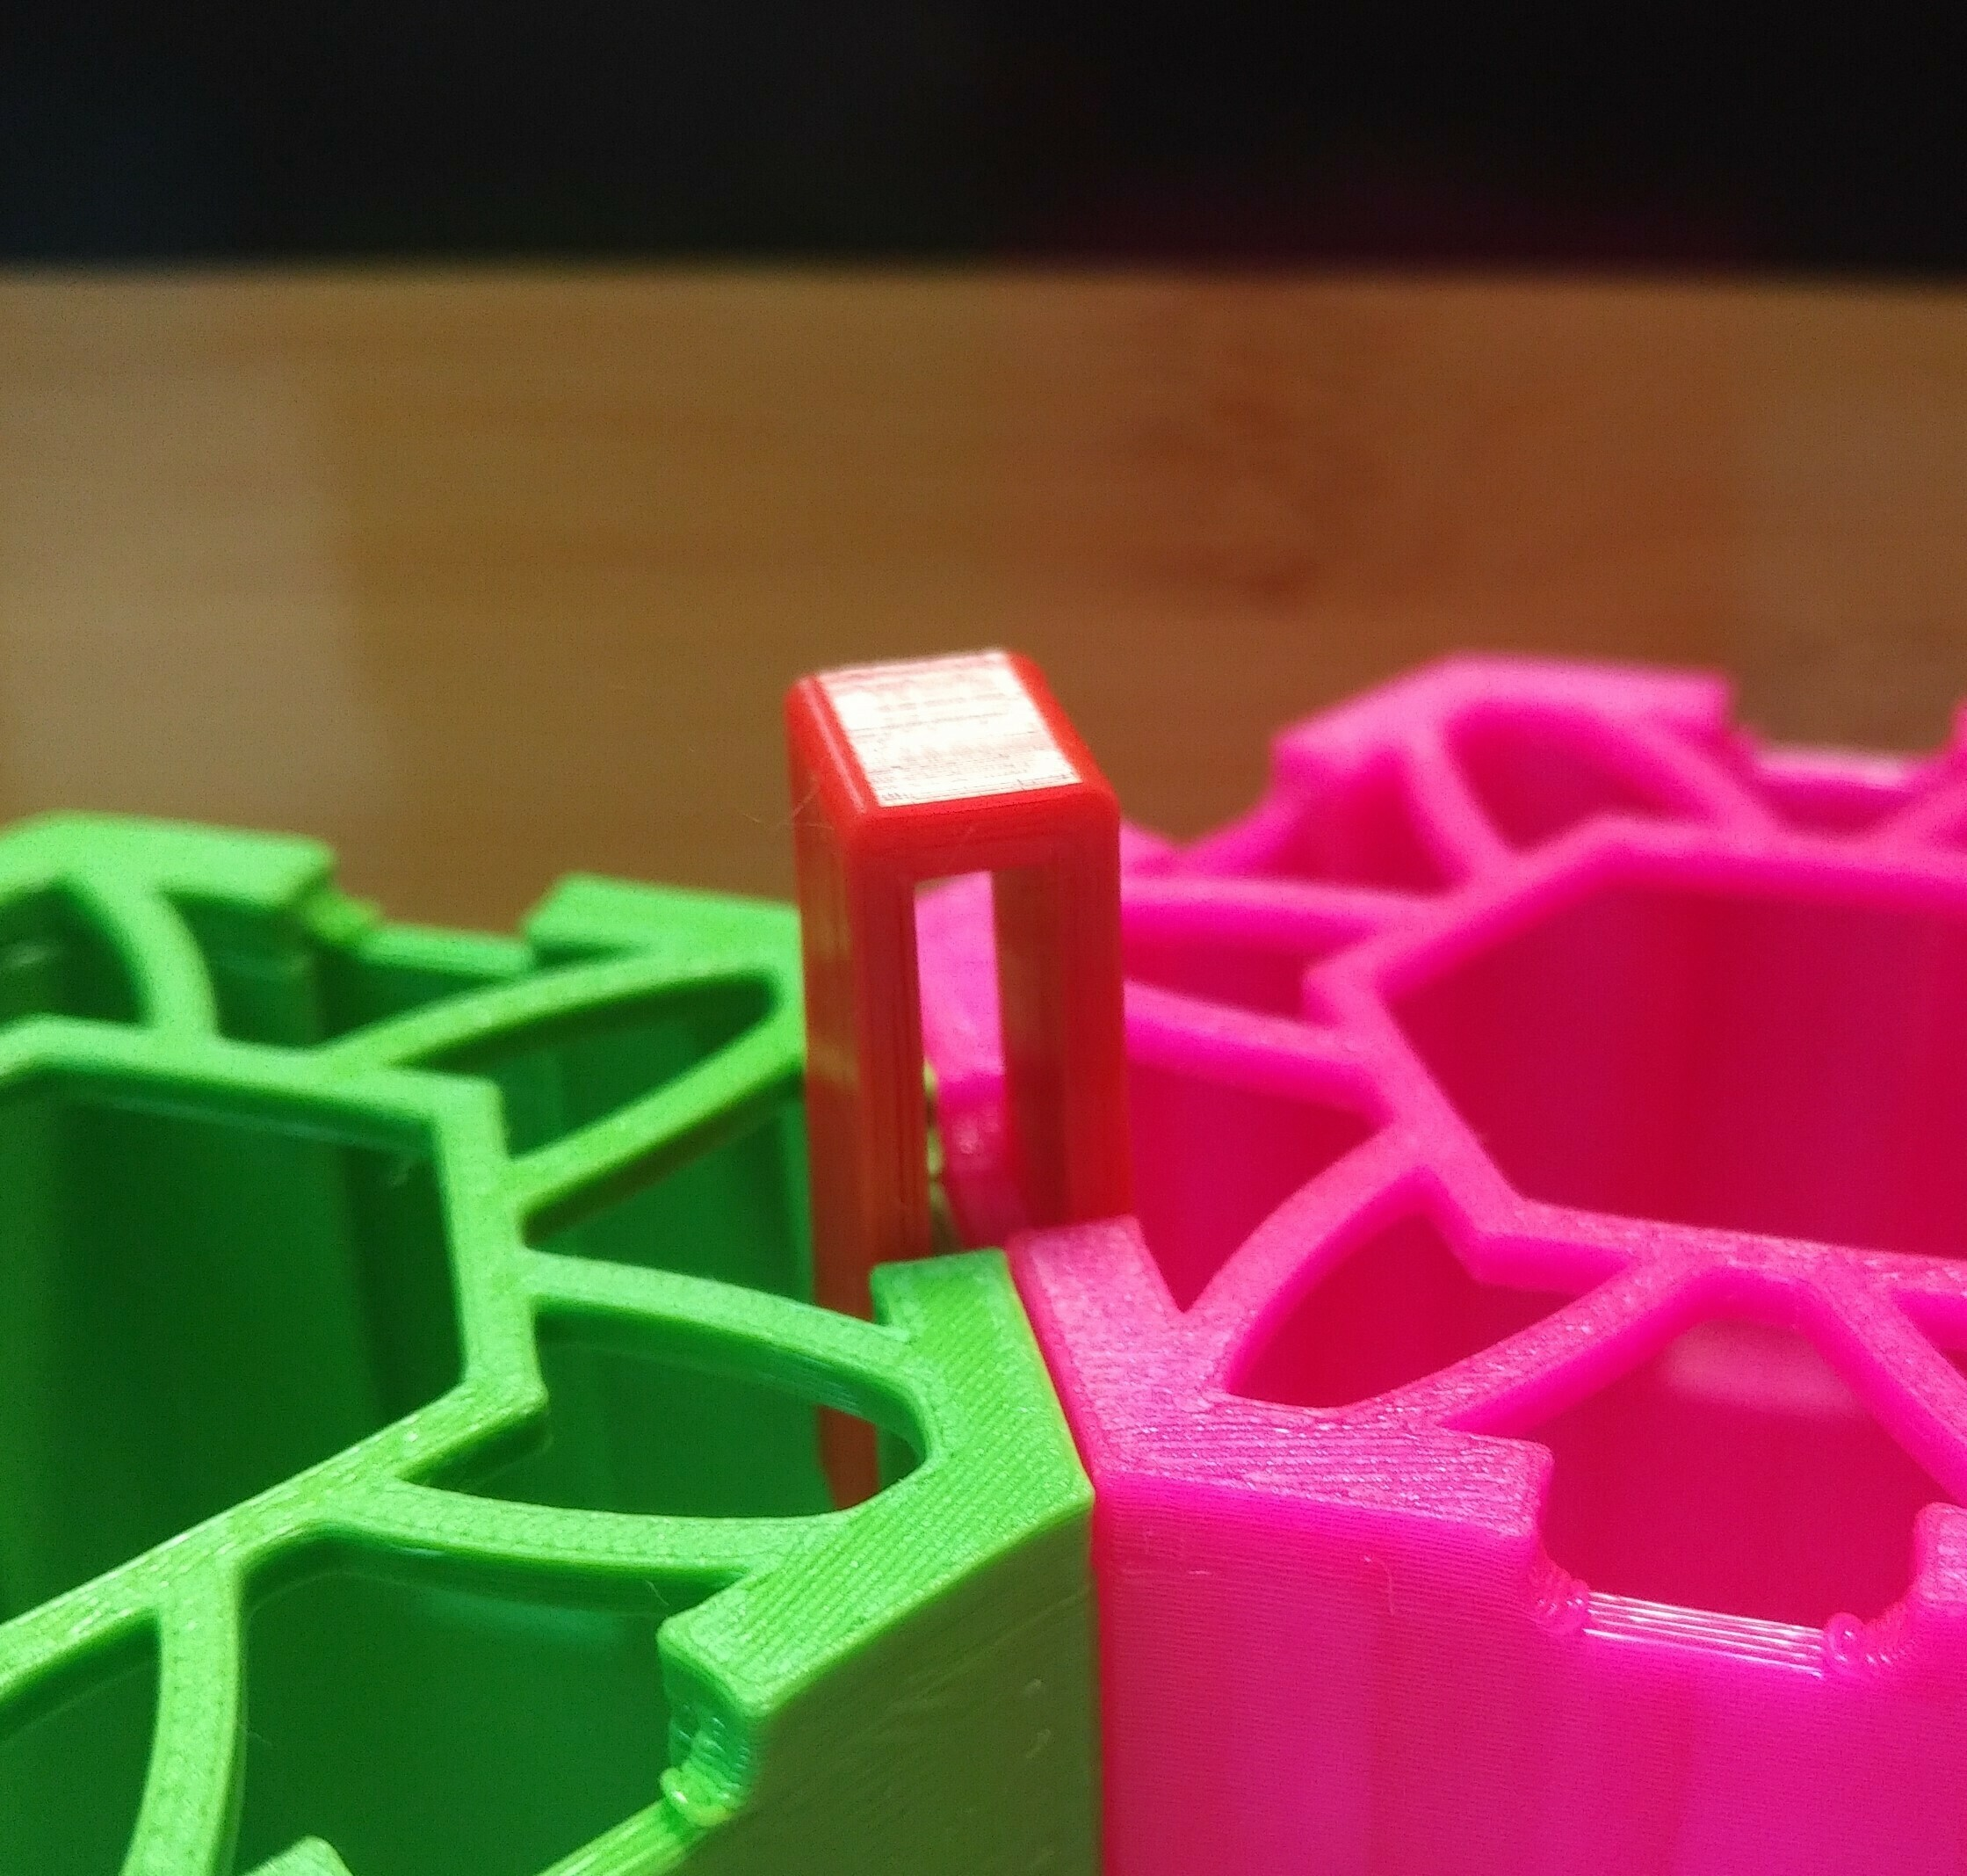 hon-clip-q.jpg Download STL file Modular Spice Rack • 3D printable template, TimBauer-TB3Dprint